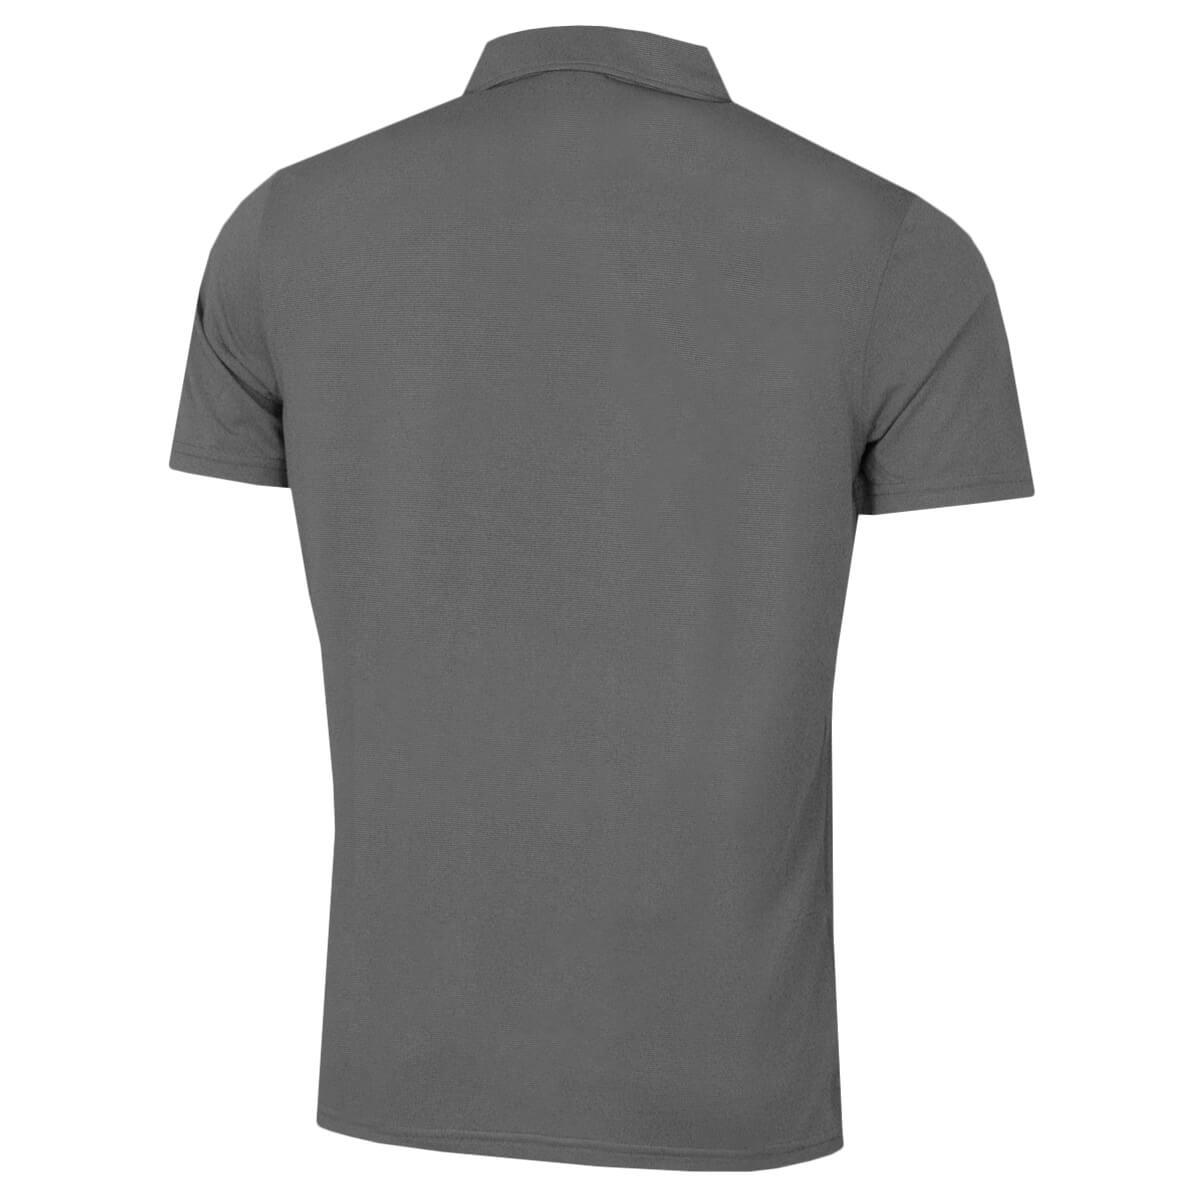 thumbnail 15 - Calvin Klein Mens 2021 Central Eco Light Wicking Golf Polo Shirt 28% OFF RRP